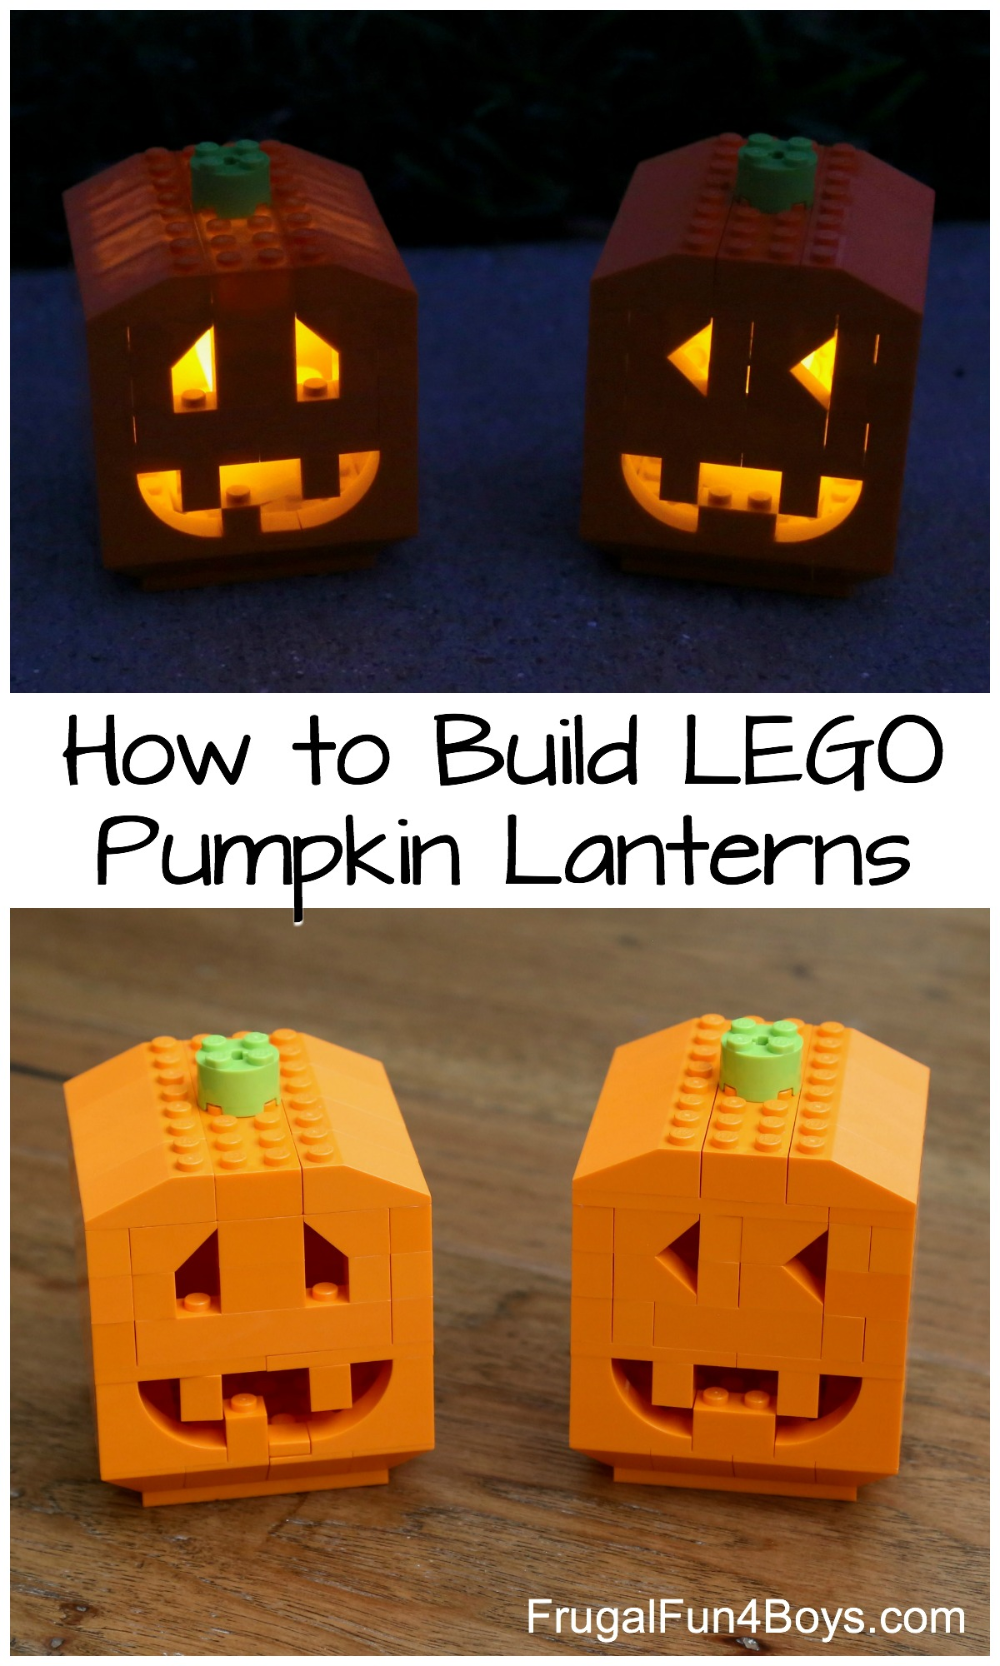 How To Build Pumpkin Lanterns With Lego Bricks Frugal Fun For Boys And Girls Lego Pumpkin Lego Halloween Lego For Kids